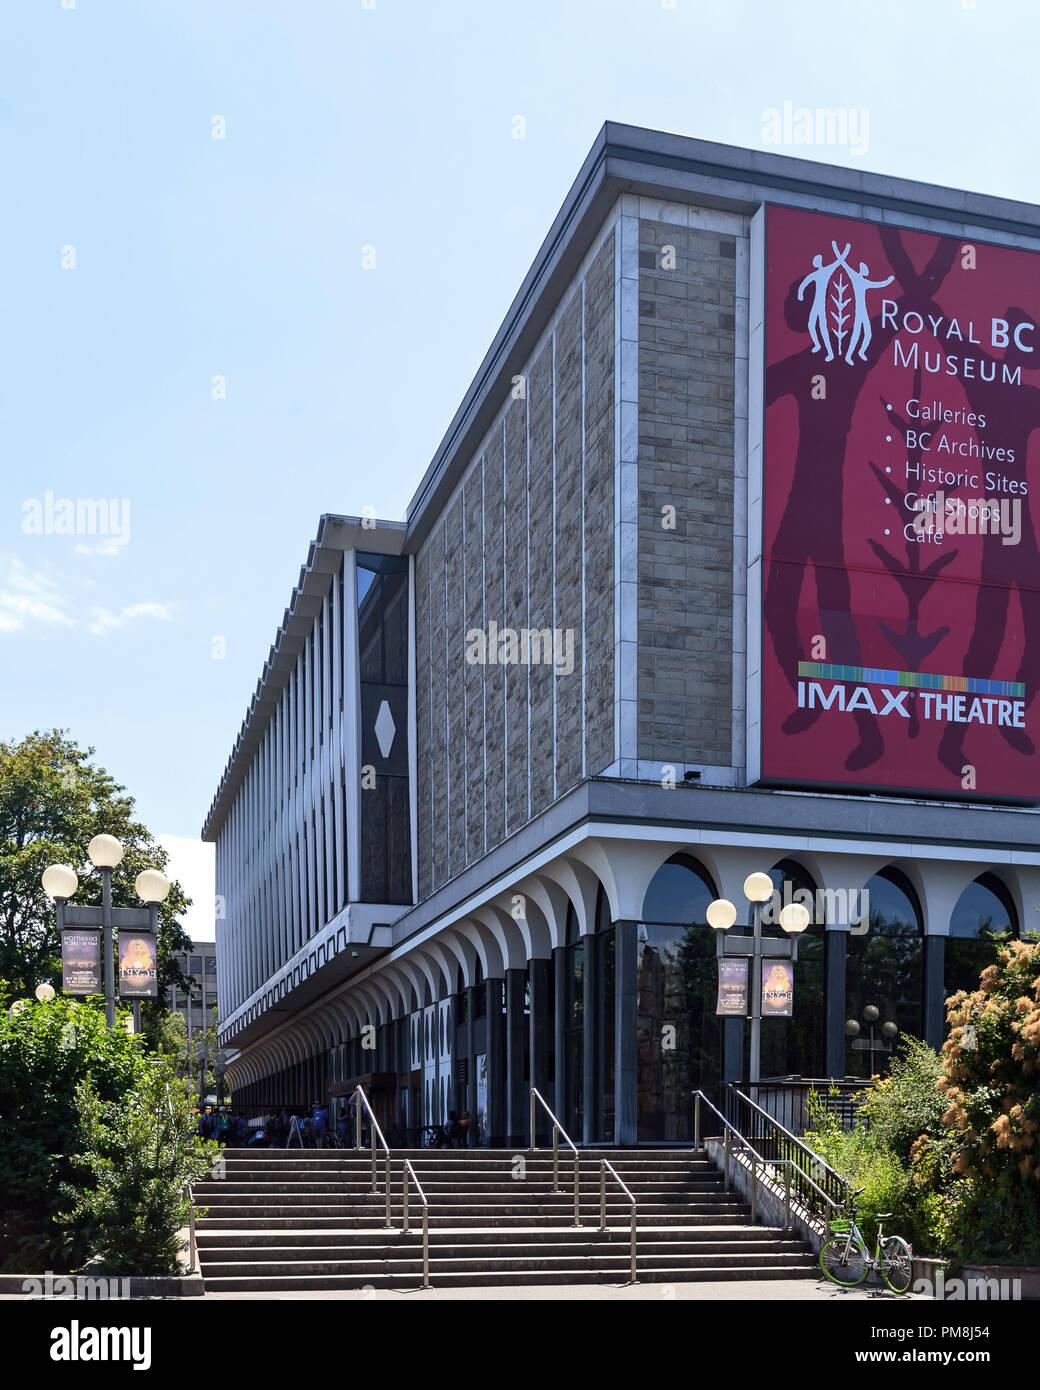 Imax theater, Royal British Columbia Museum, Victoria, capital of British Columbia, Canada - Stock Image